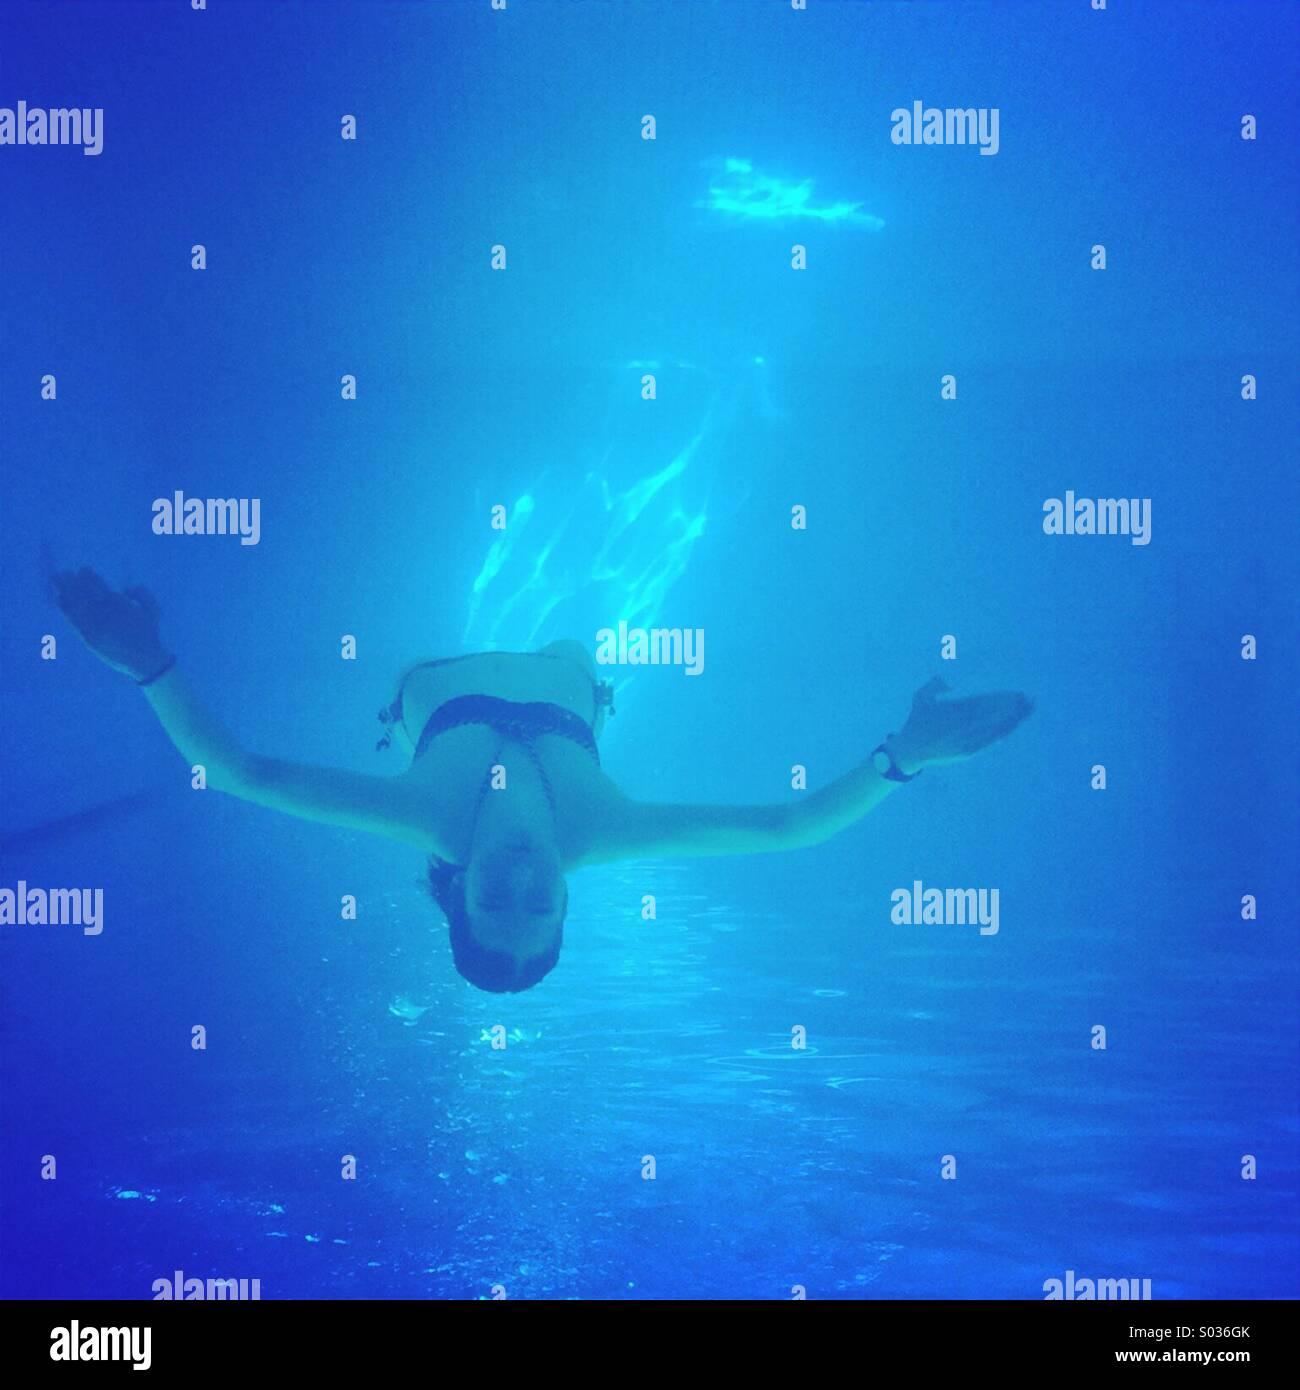 Mermaid - Stock Image